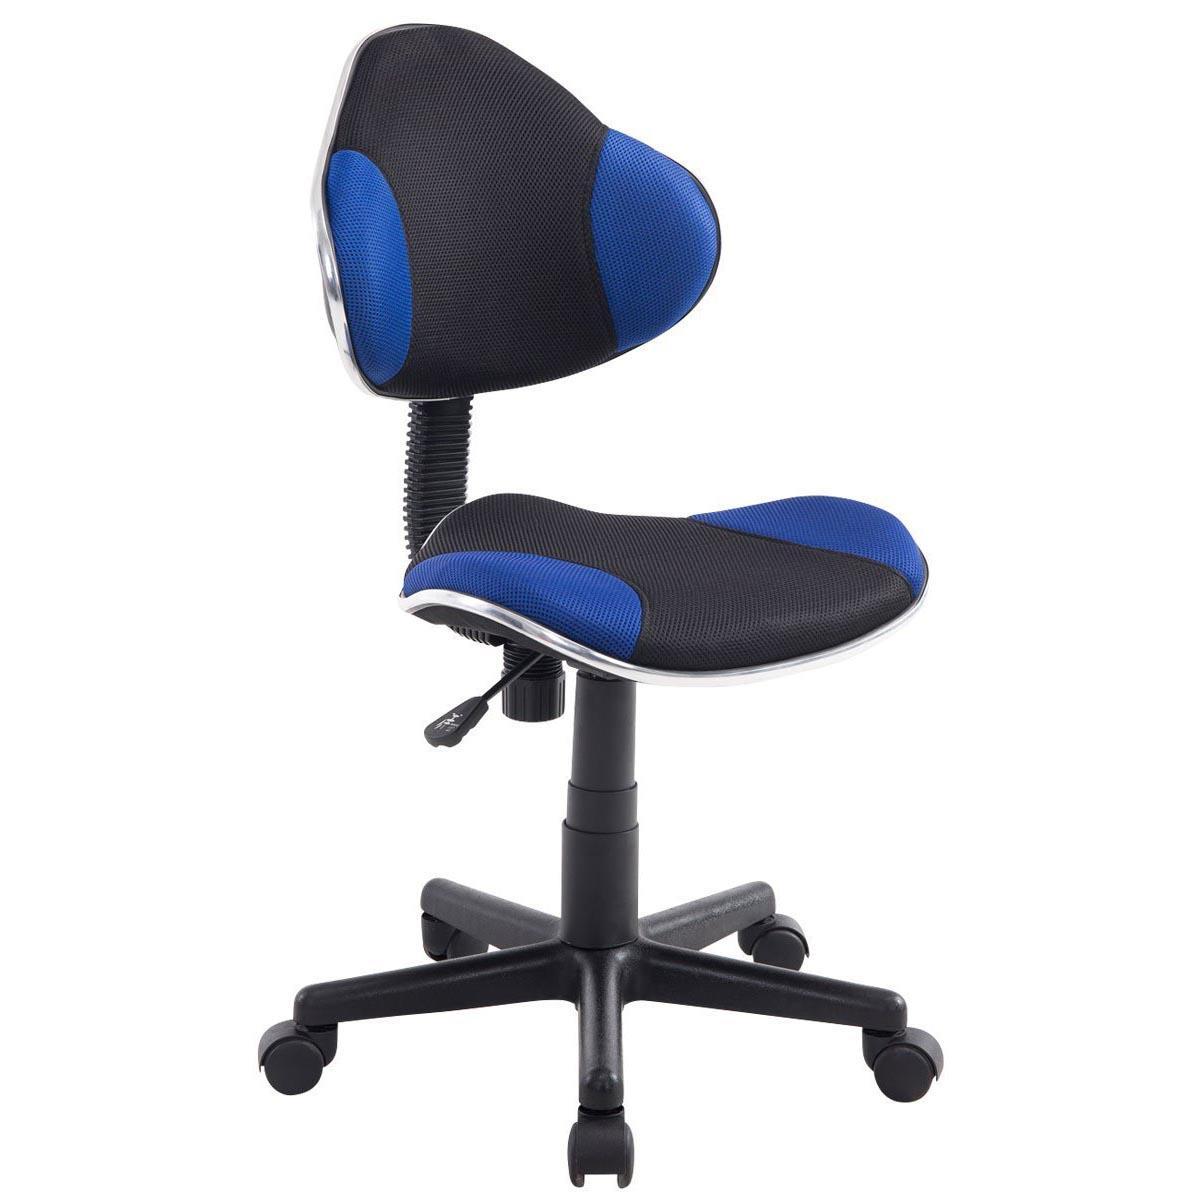 Silla escritorio juvenil baster en malla transpirable for Precio silla escritorio